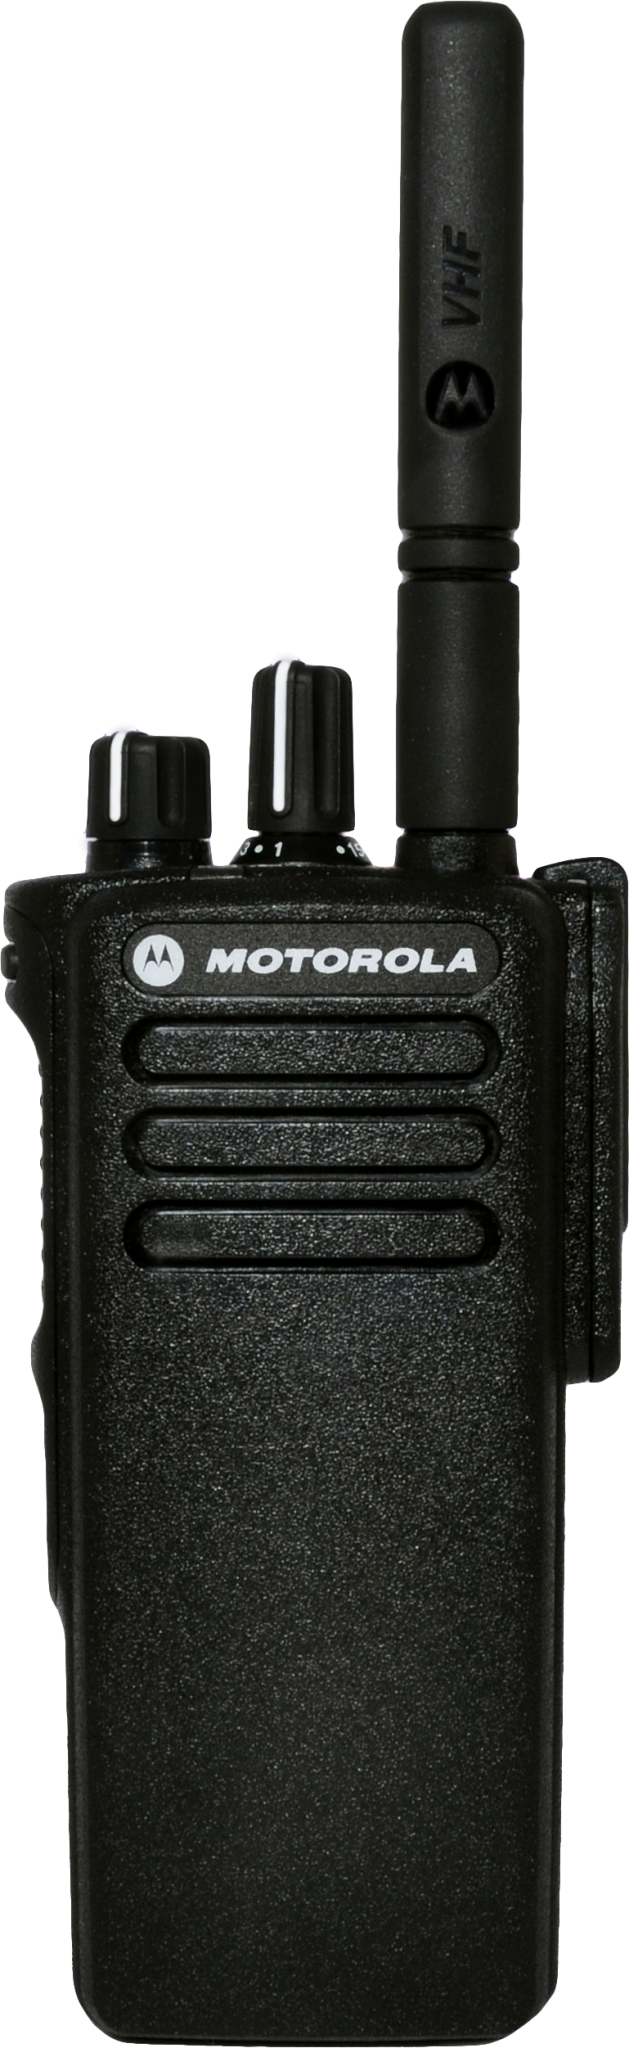 Motorola DP4400e featured image